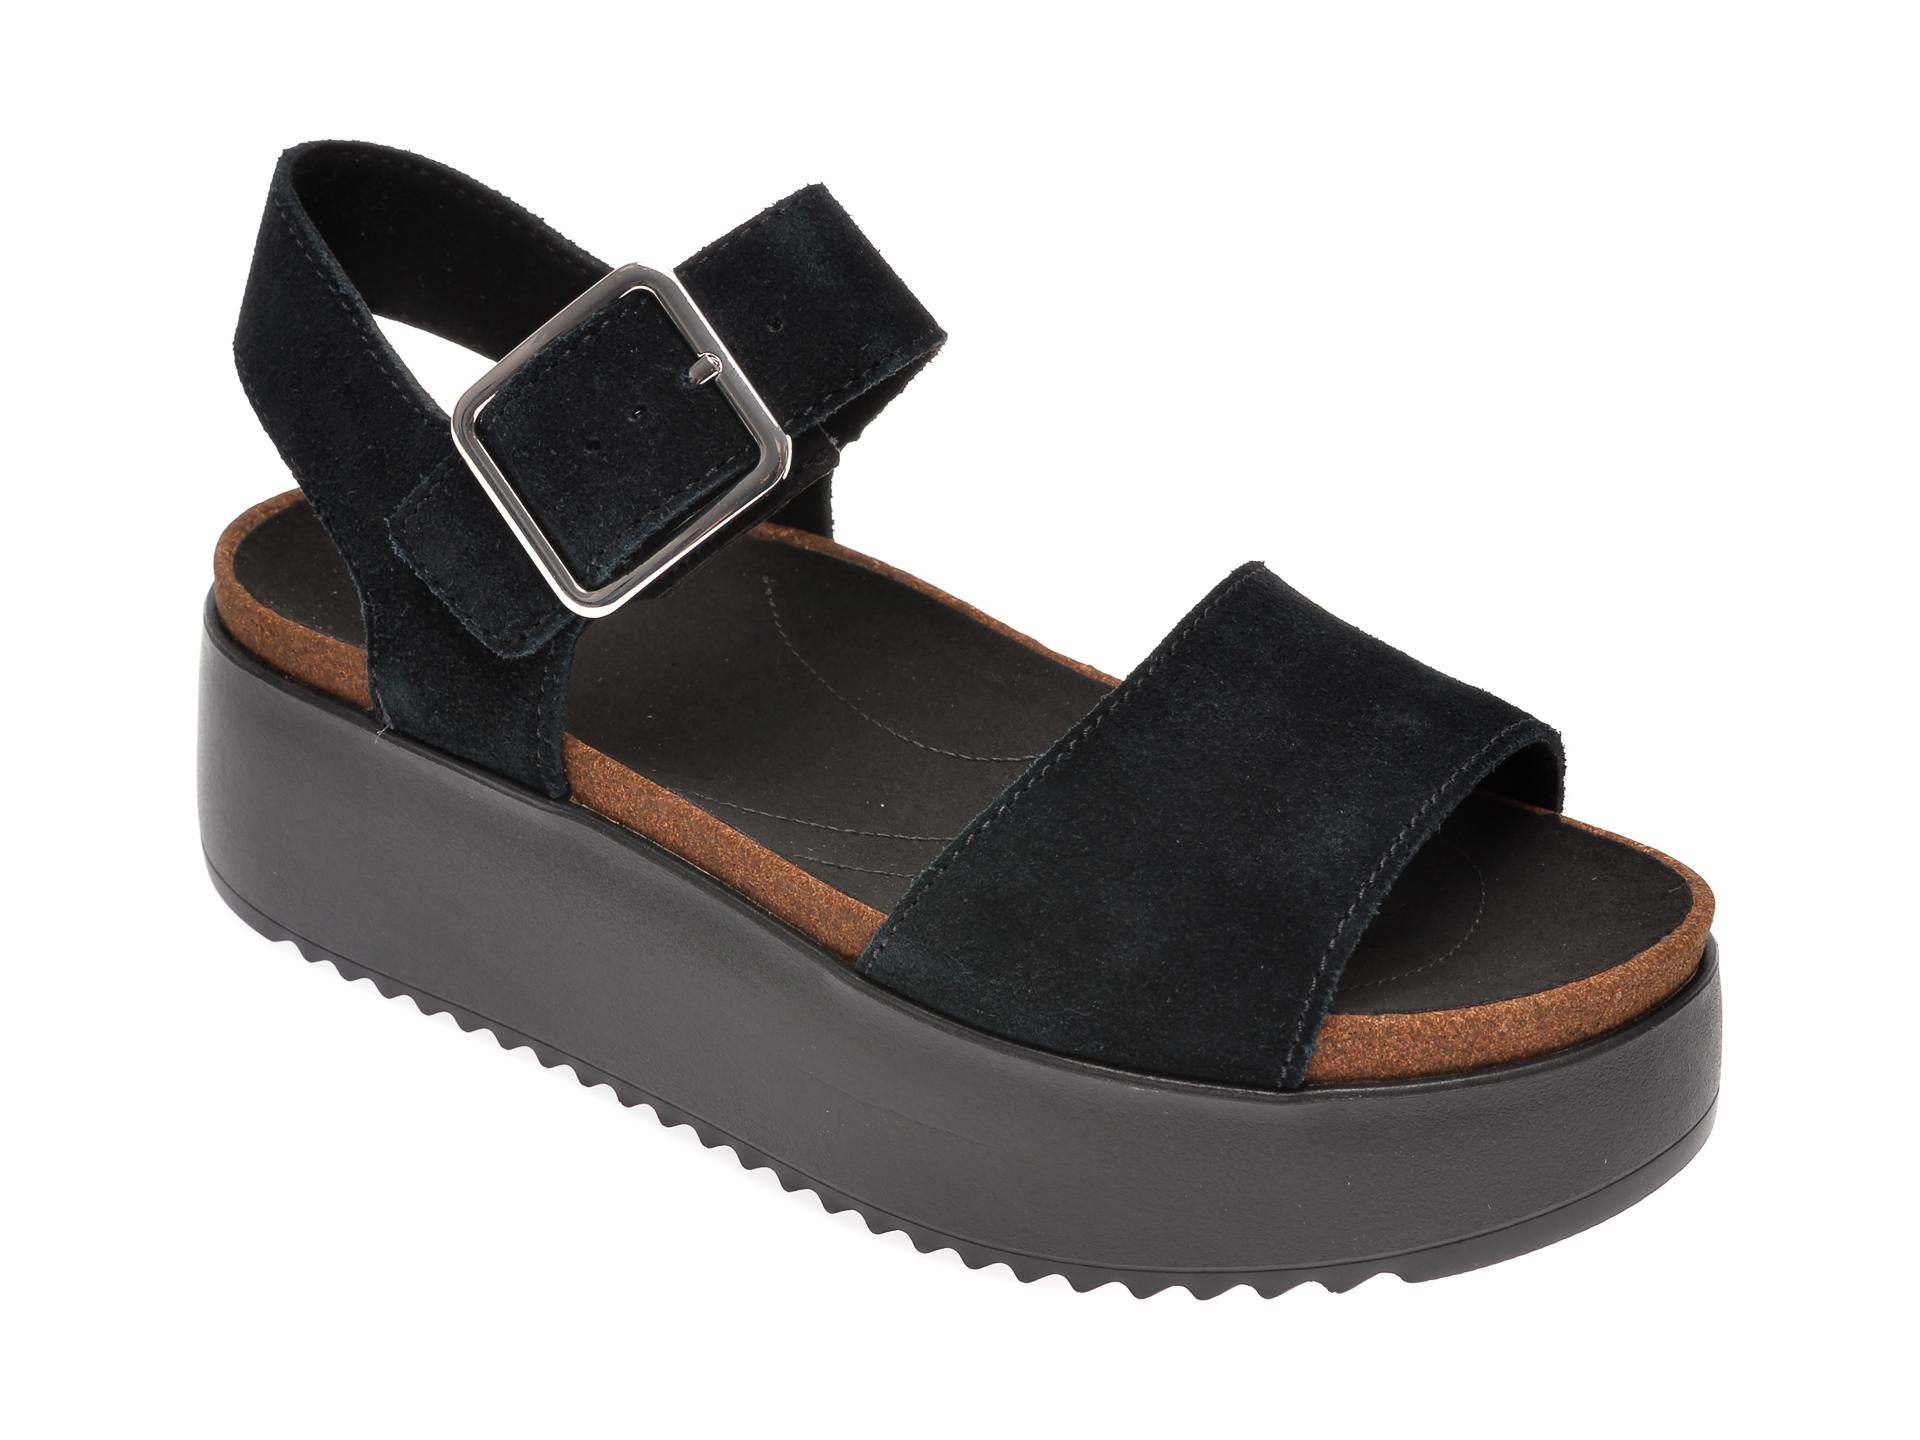 Sandale CLARKS negre, Botanic Strap, din piele intoarsa